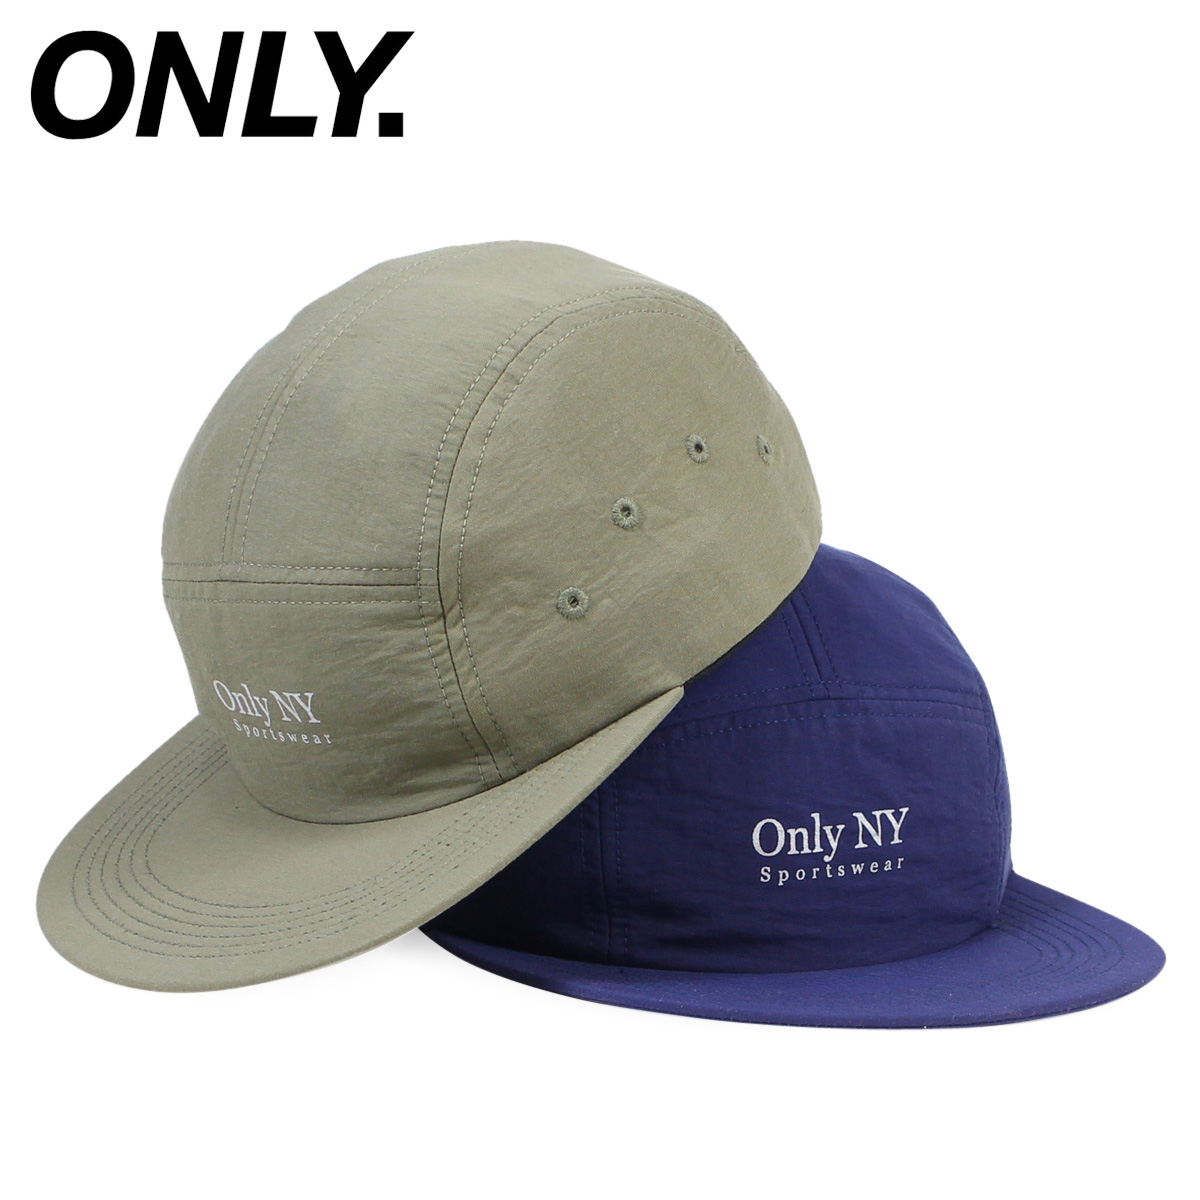 Only New York ONLY NY cap hat men gap Dis GUIDELINE 5-PANEL CAP strap back  nylon  12 22 Shinnyu load  2aaf697695ec